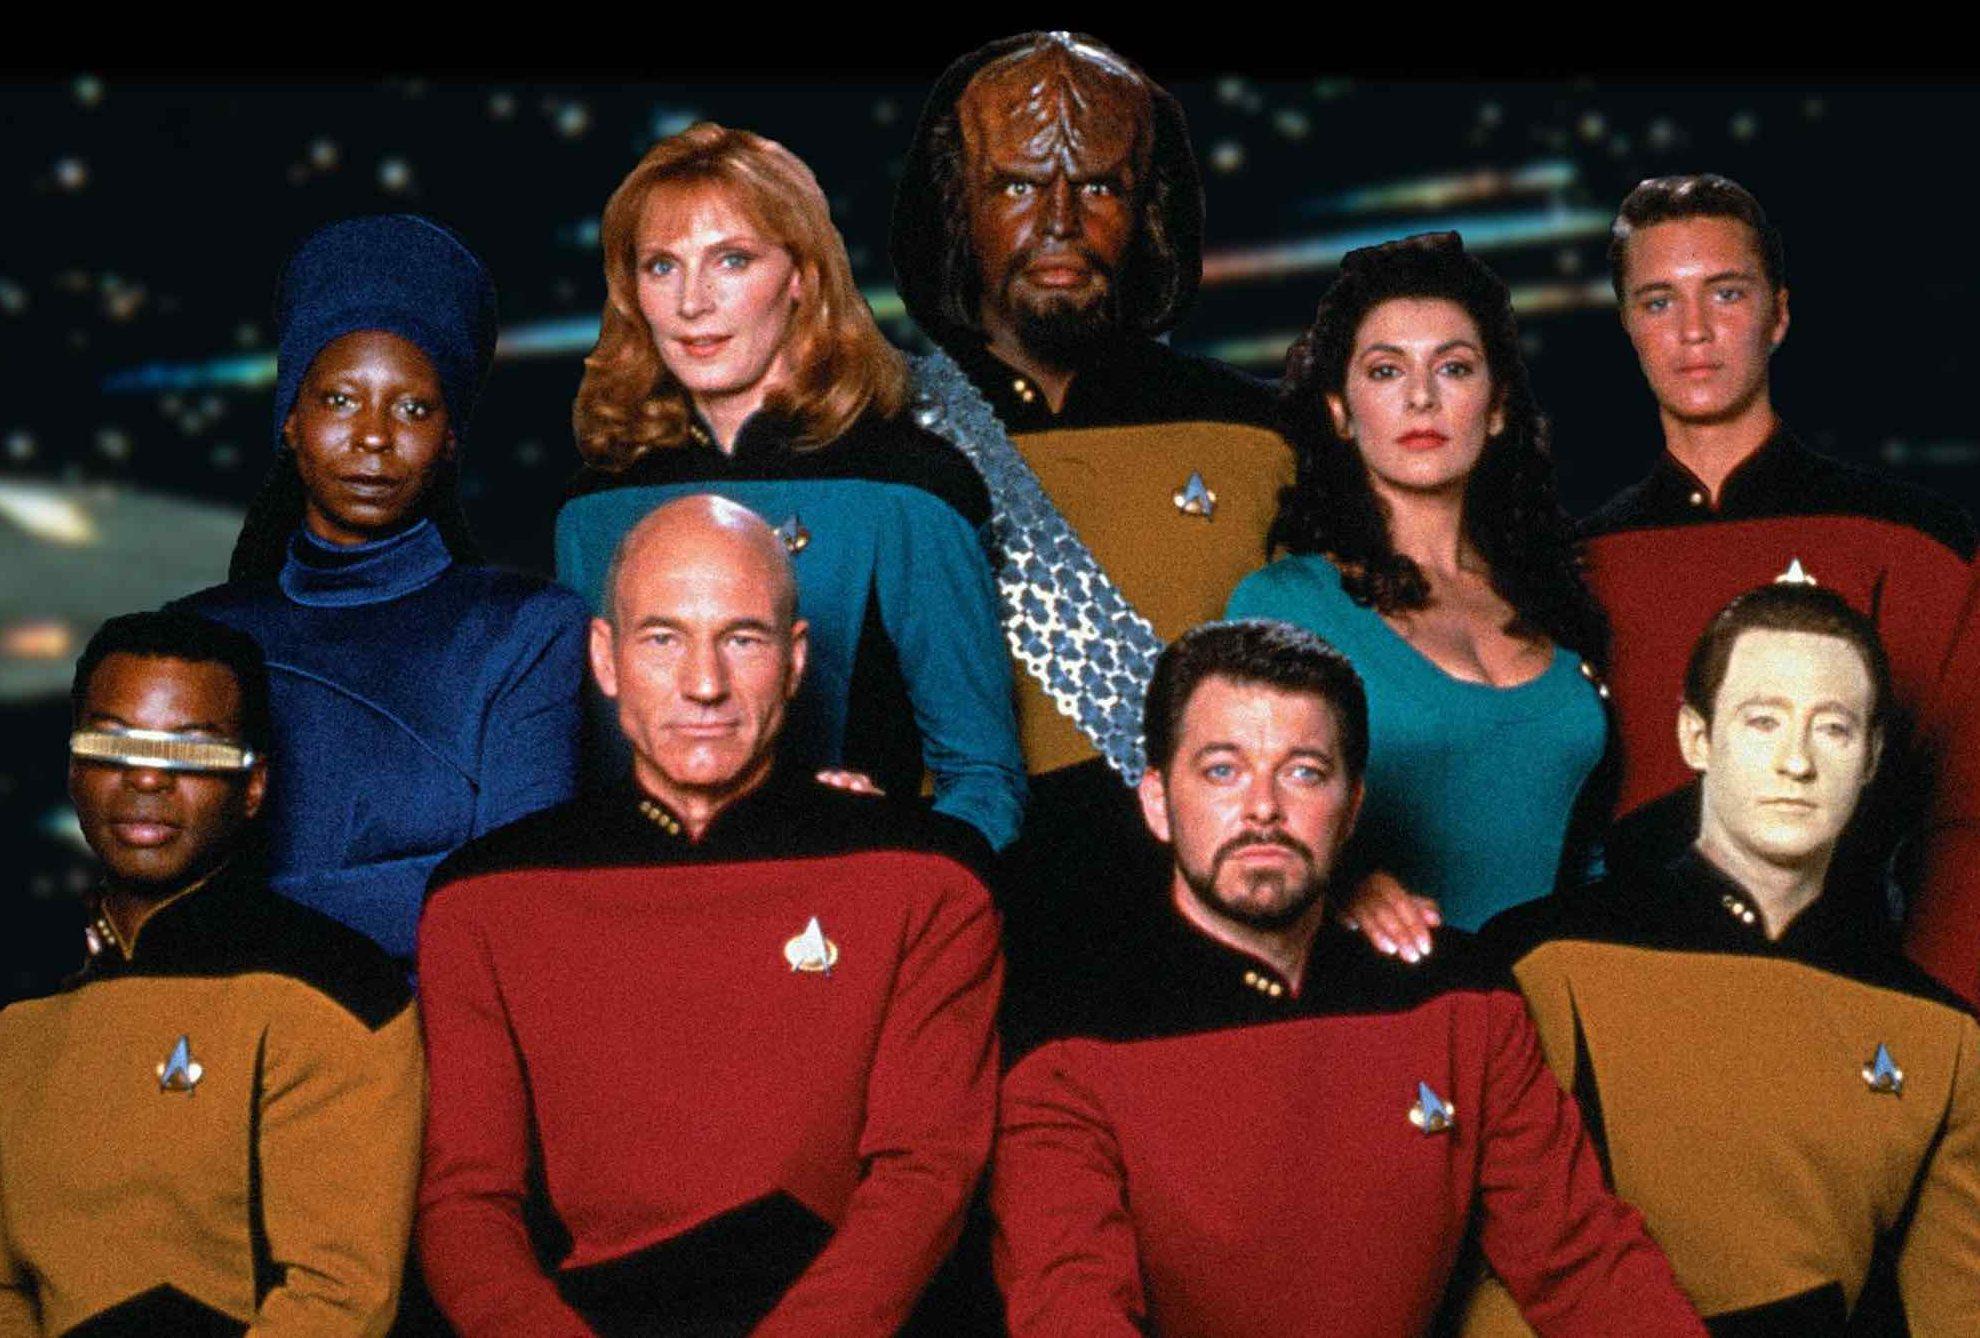 star trek lede e1621342396410 Star Trek: All The Live-Action Movies & TV Shows, Ranked!